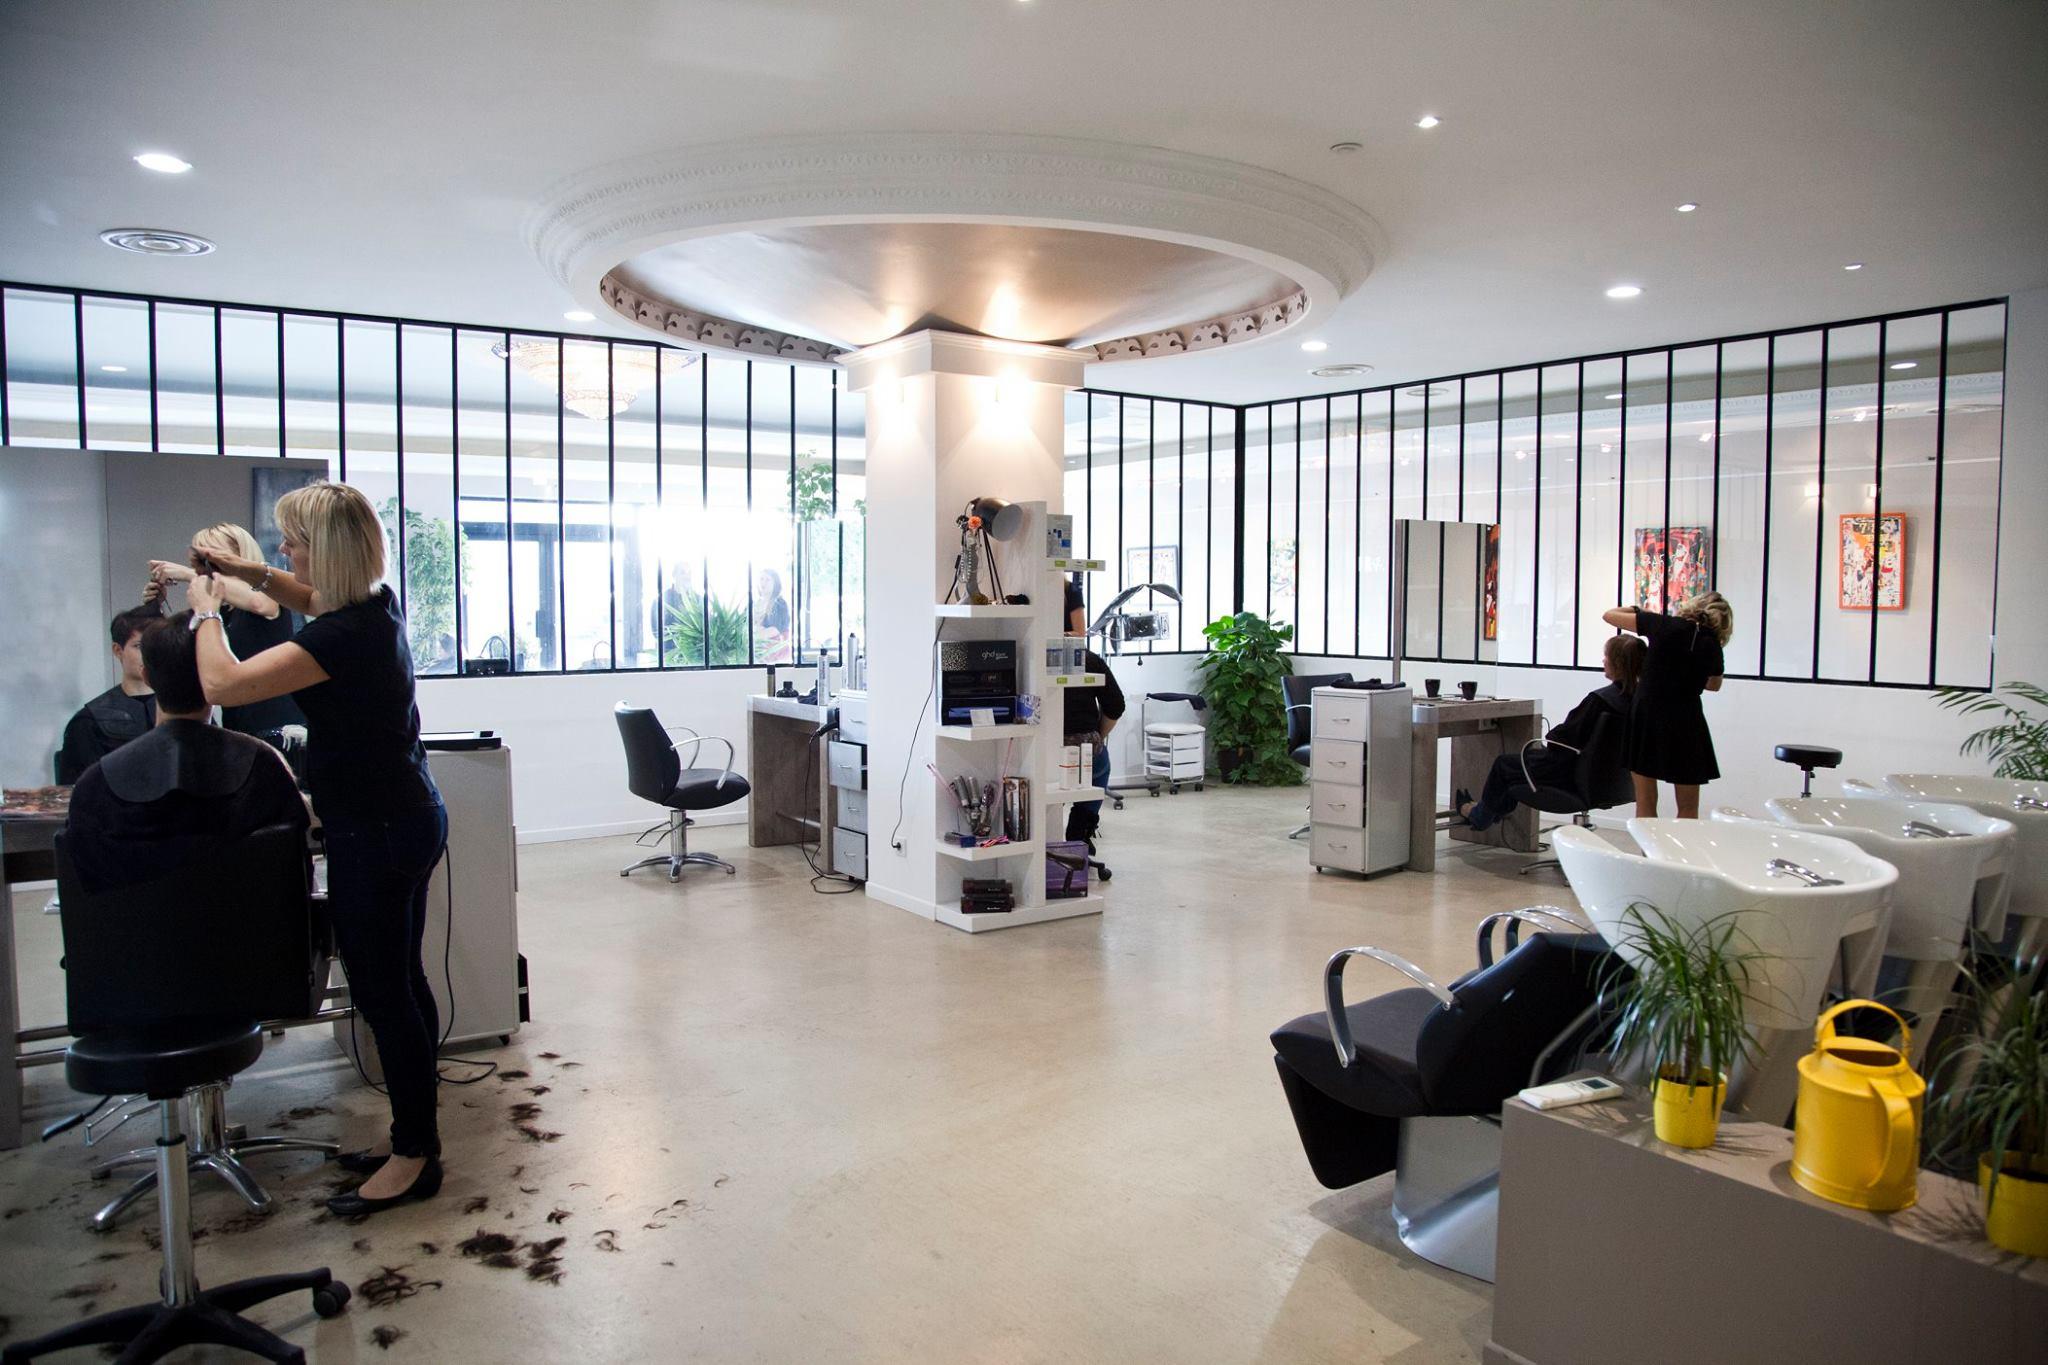 LM coiffure - Saint-Germain